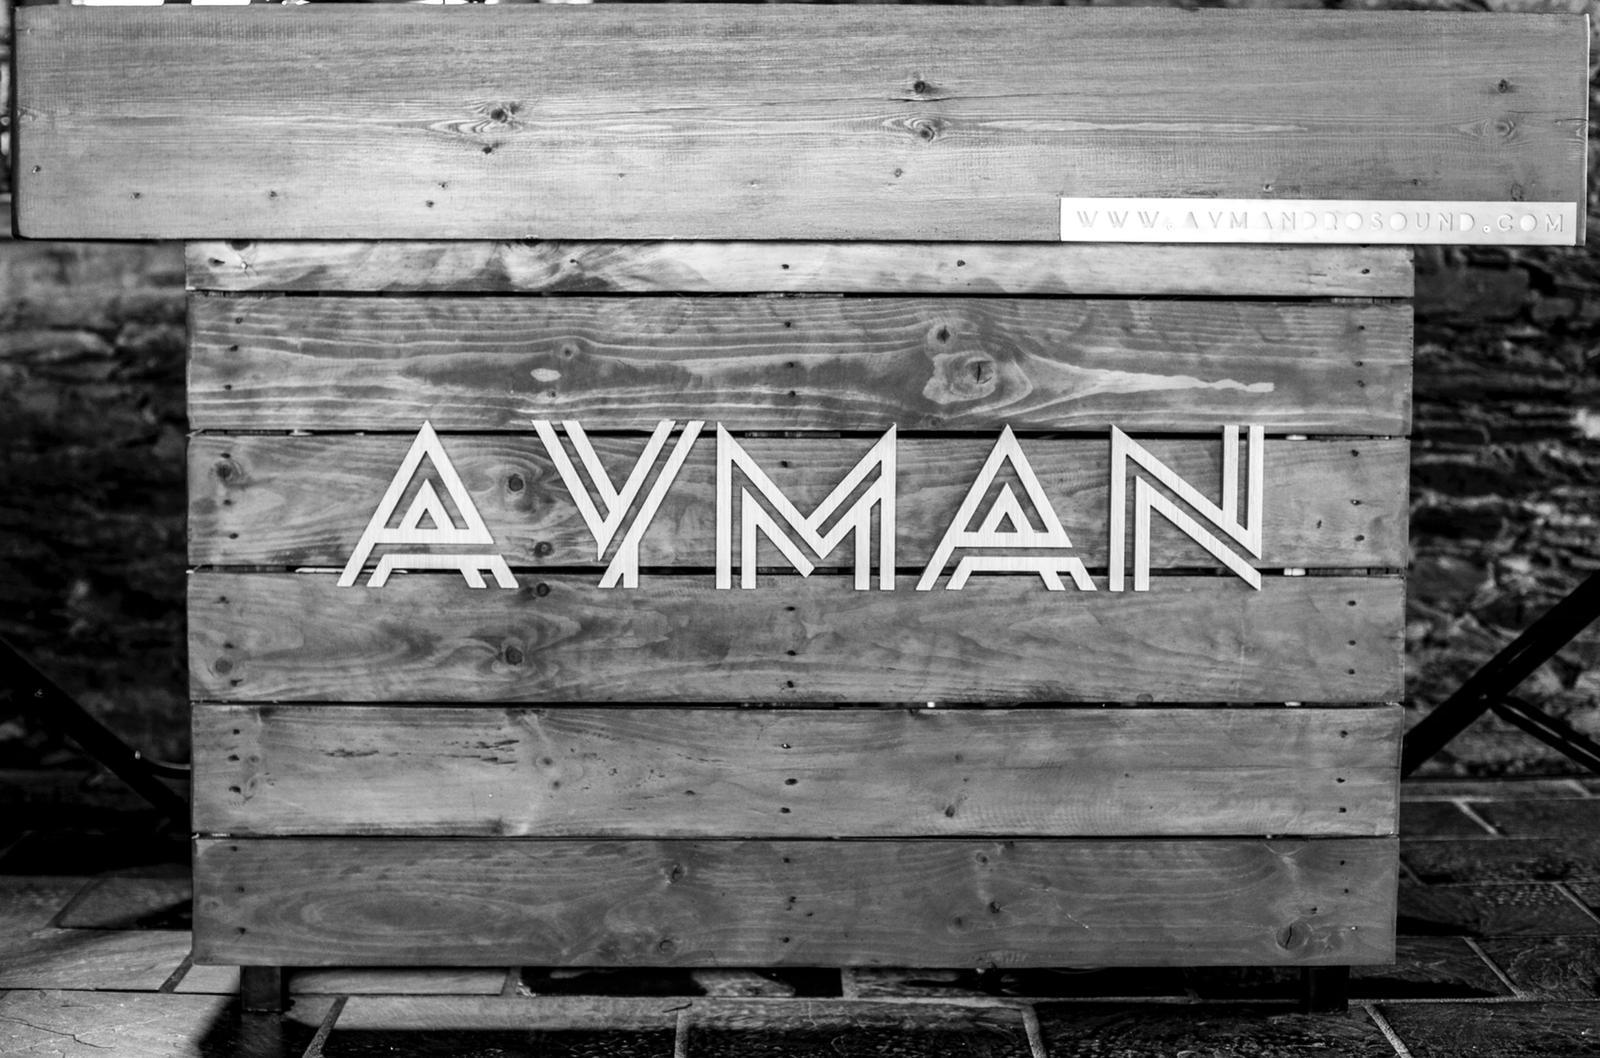 Cabina dj Ayman Prosound